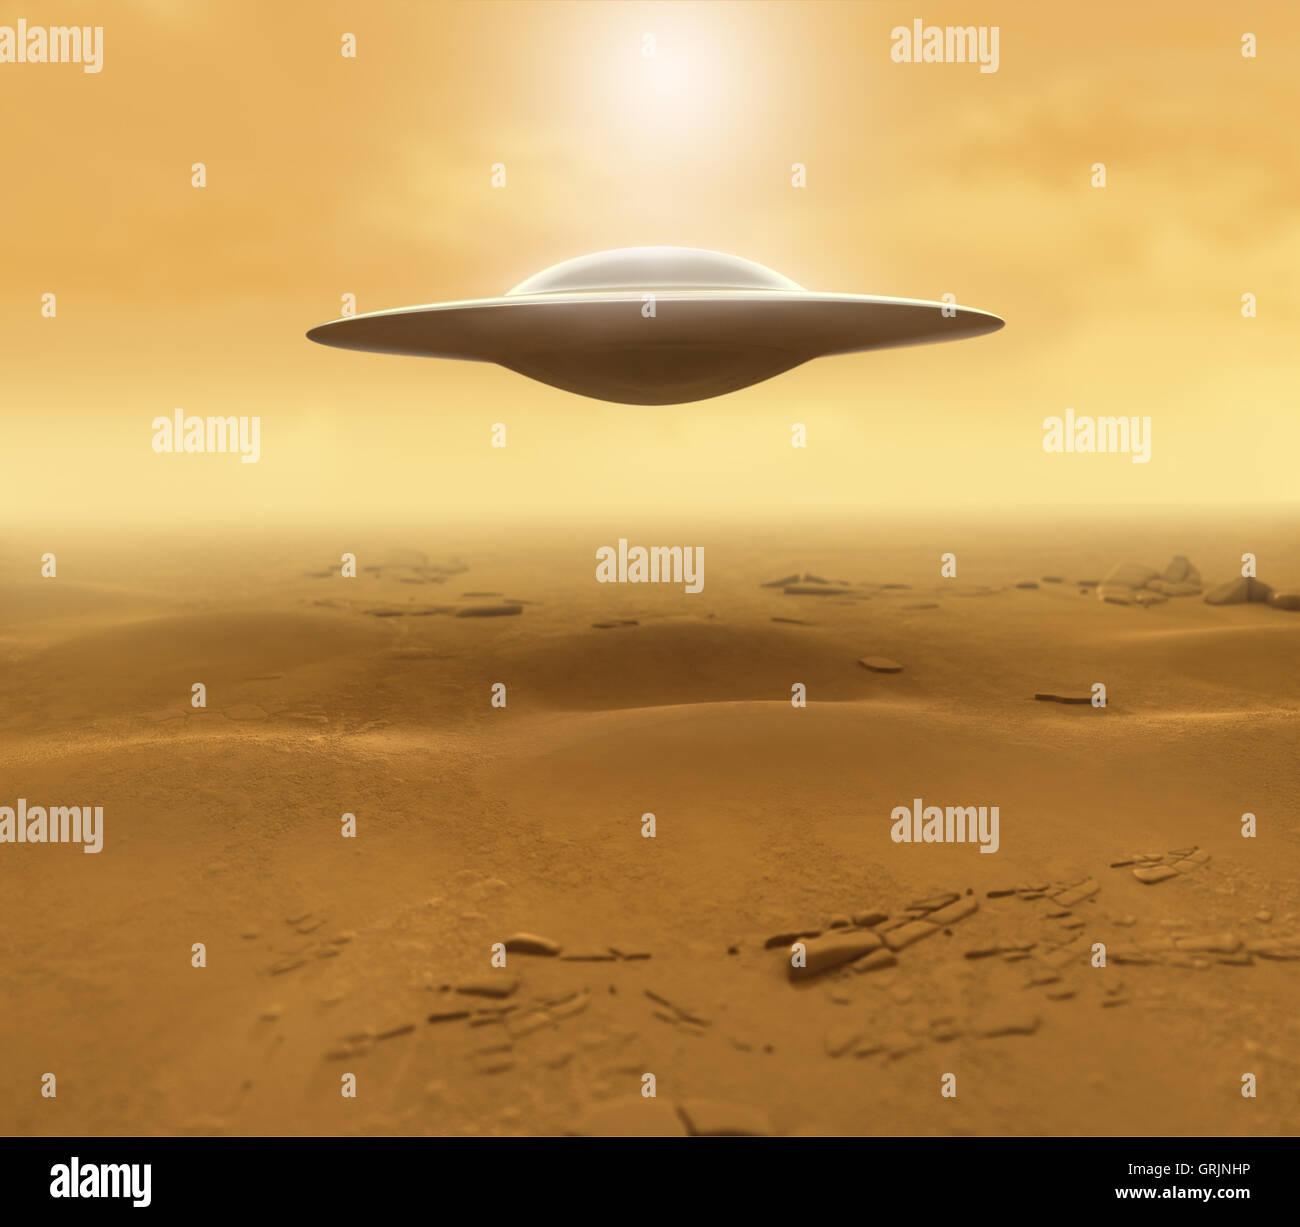 UFO in the Desert - Stock Image